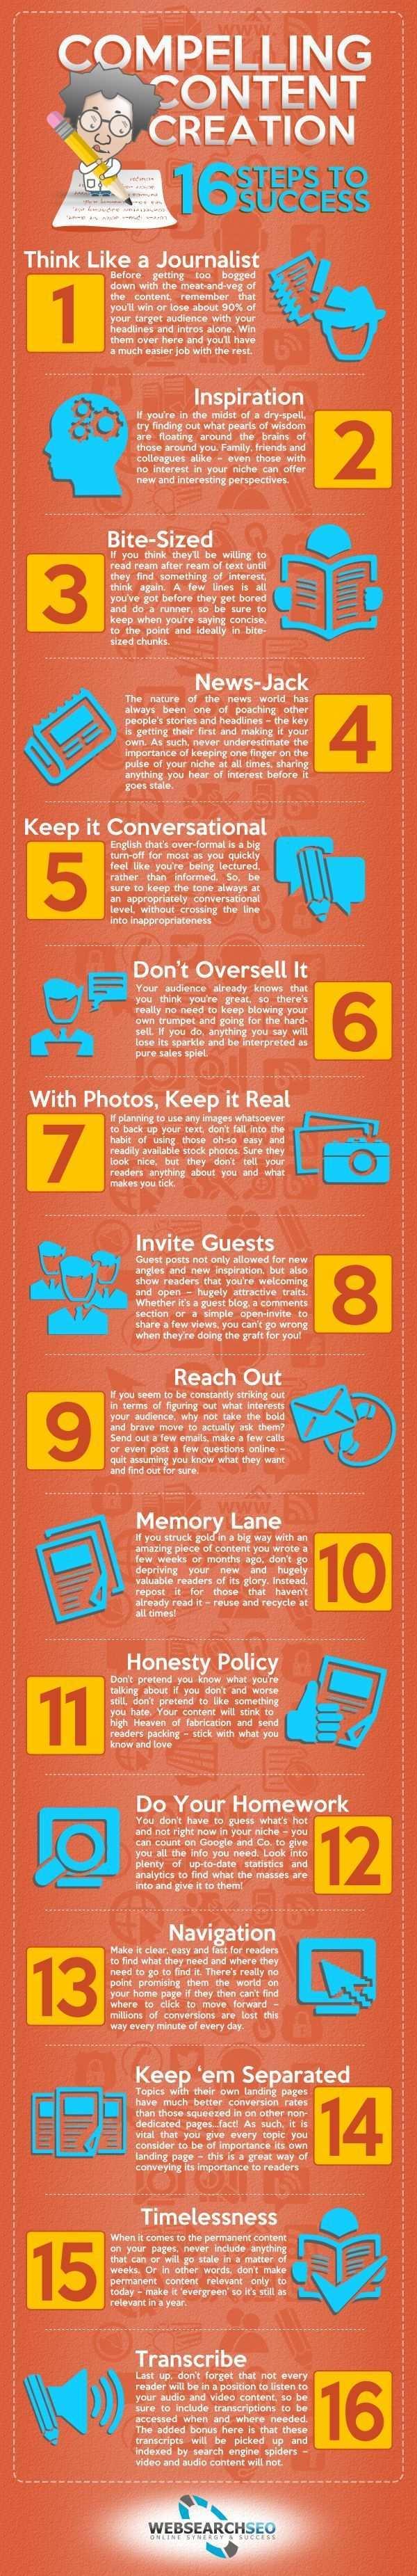 16 Steps To Successful Content Marketing Marketing De Contenu Commercialisation